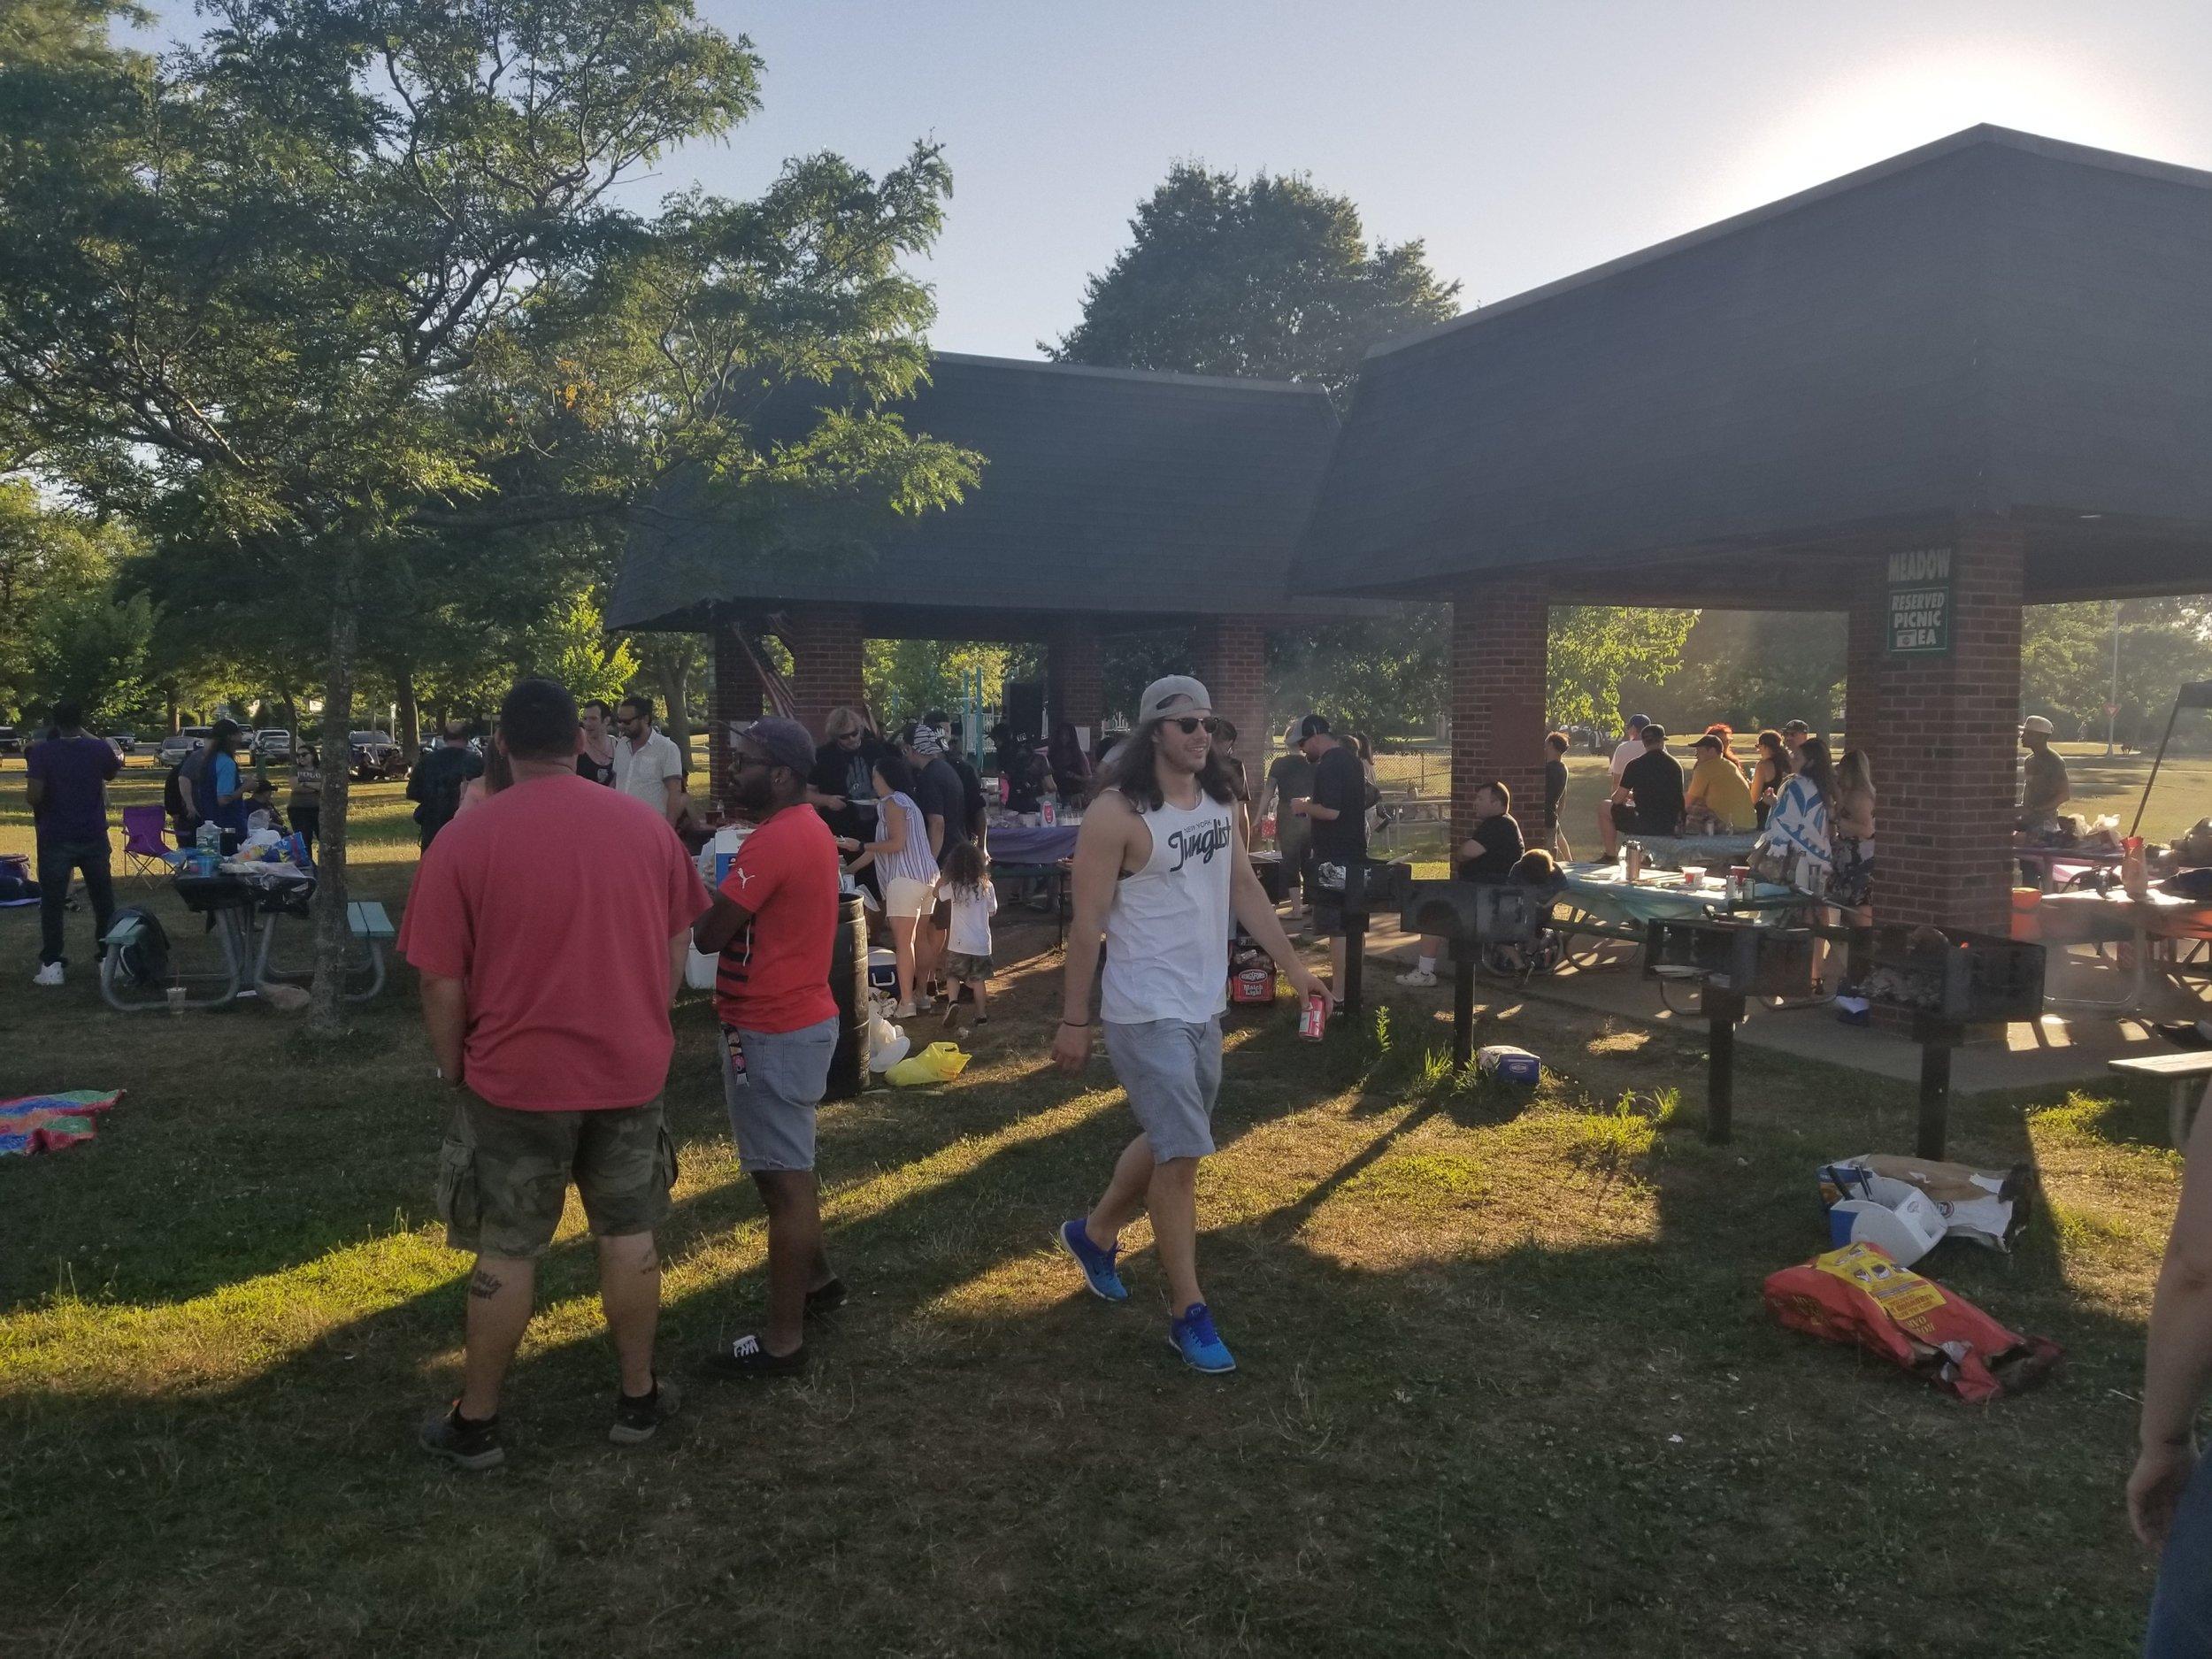 DJ STRIFE @ 14th Annual DnB BBQ - Cedar Creek Park, New York  July 7th, 2018   https://youtu.be/0IcjQg35_TM